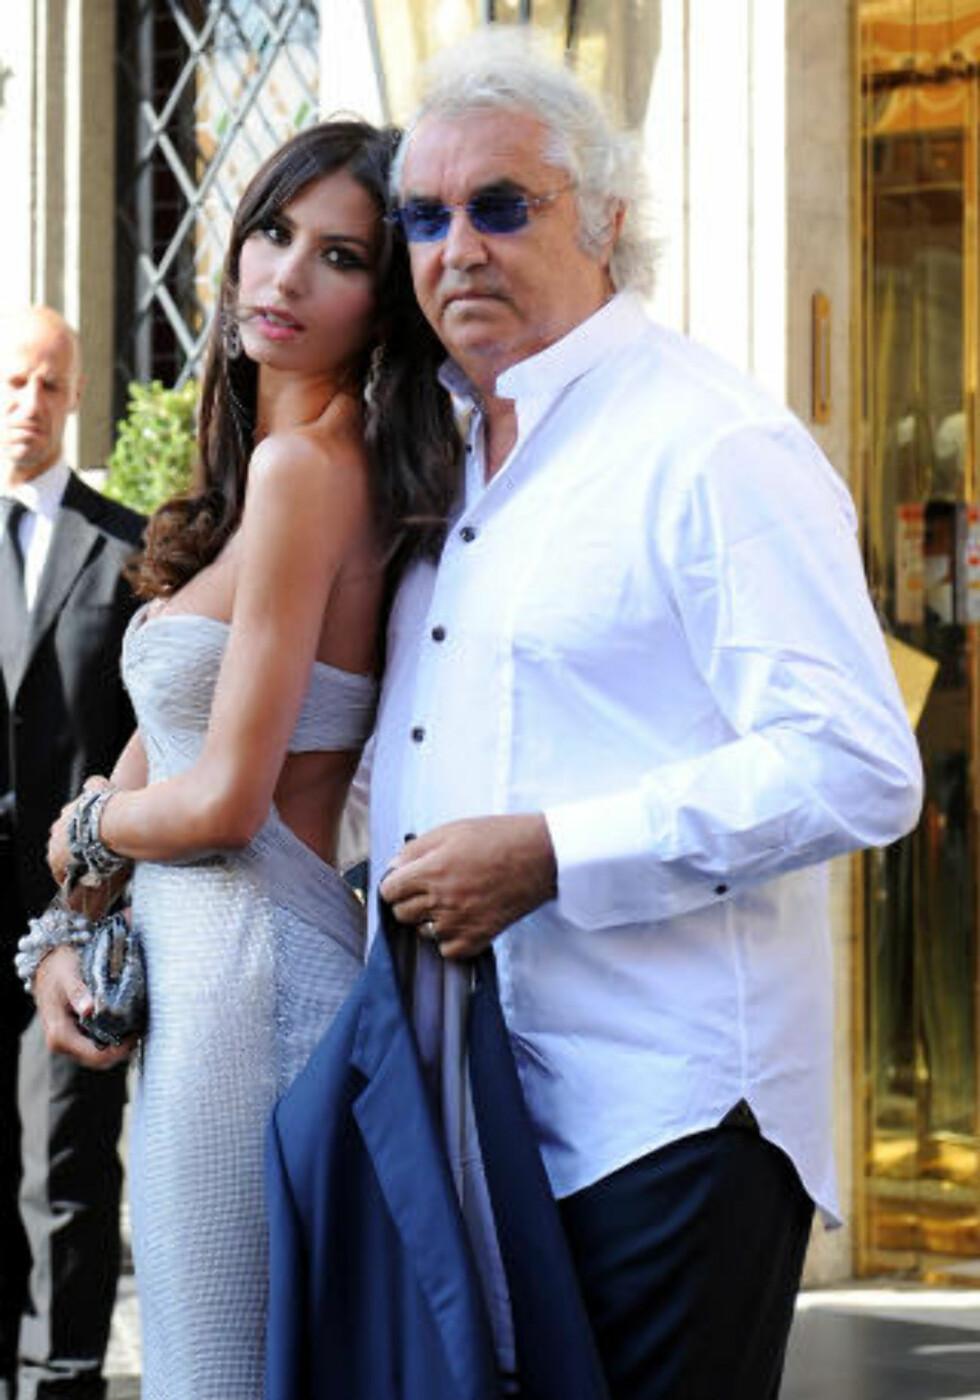 KONTROVERSIELL: Tidligere QPR-eier Flavio Briatore, her med kona Elisabetta Gregoraci, har flere dommer på rullebladet. Foto: AFP/Tiziana Fabi/Scanpix